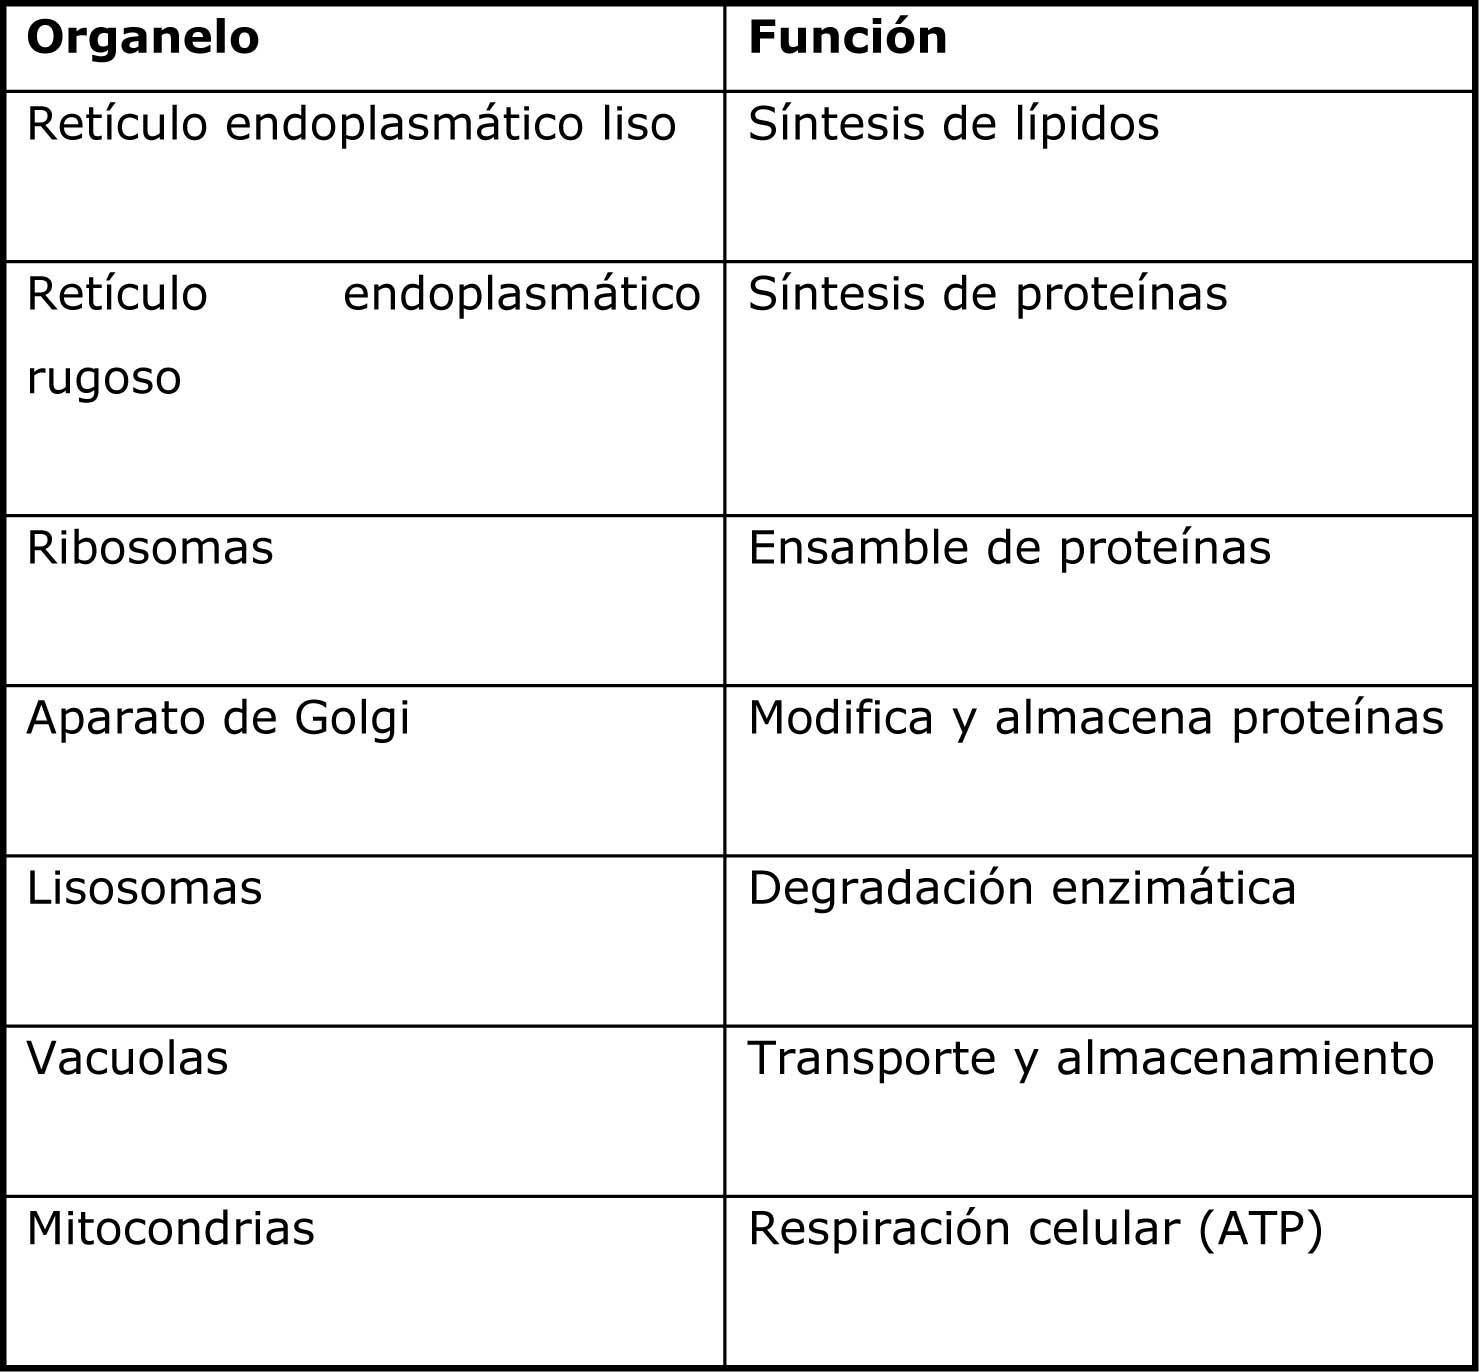 Organelos Celulares Biolog 205 A Mis Apuntes